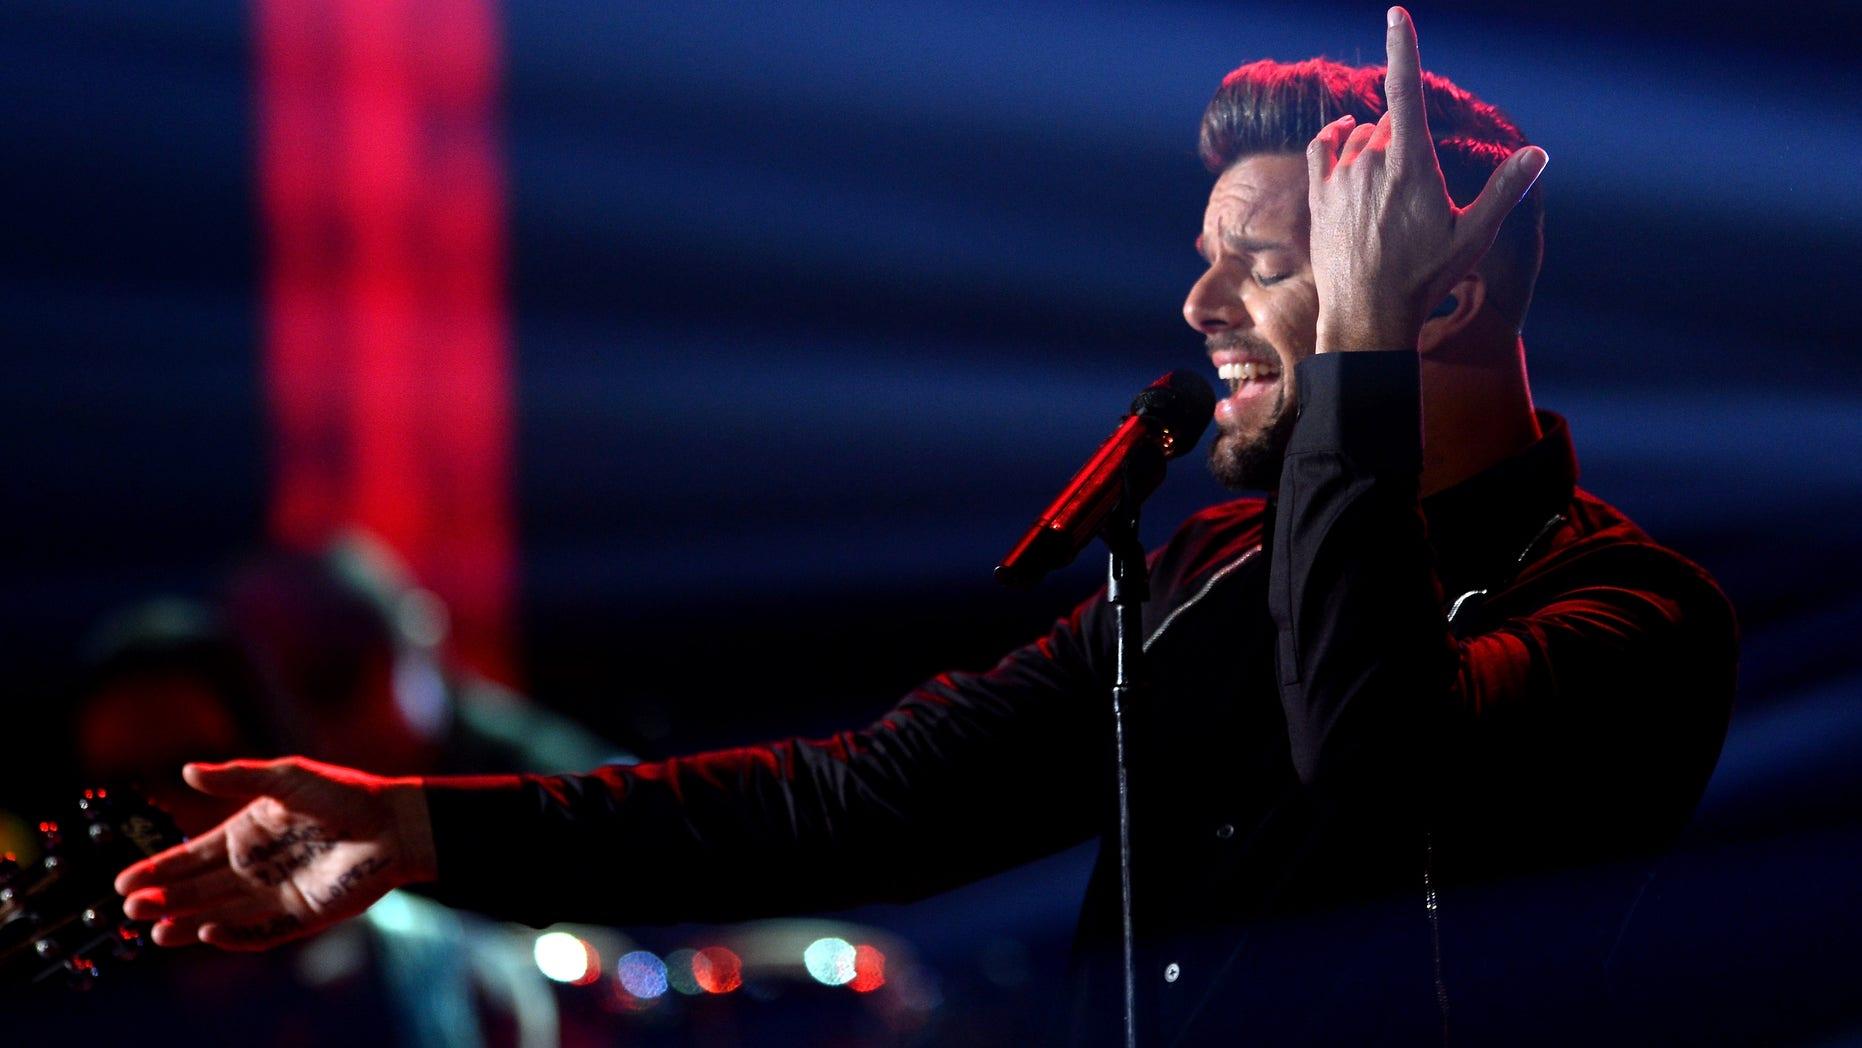 Ricky Martin during the GRAMMY Awards on November 21, 2013 in Las Vegas, Nevada.